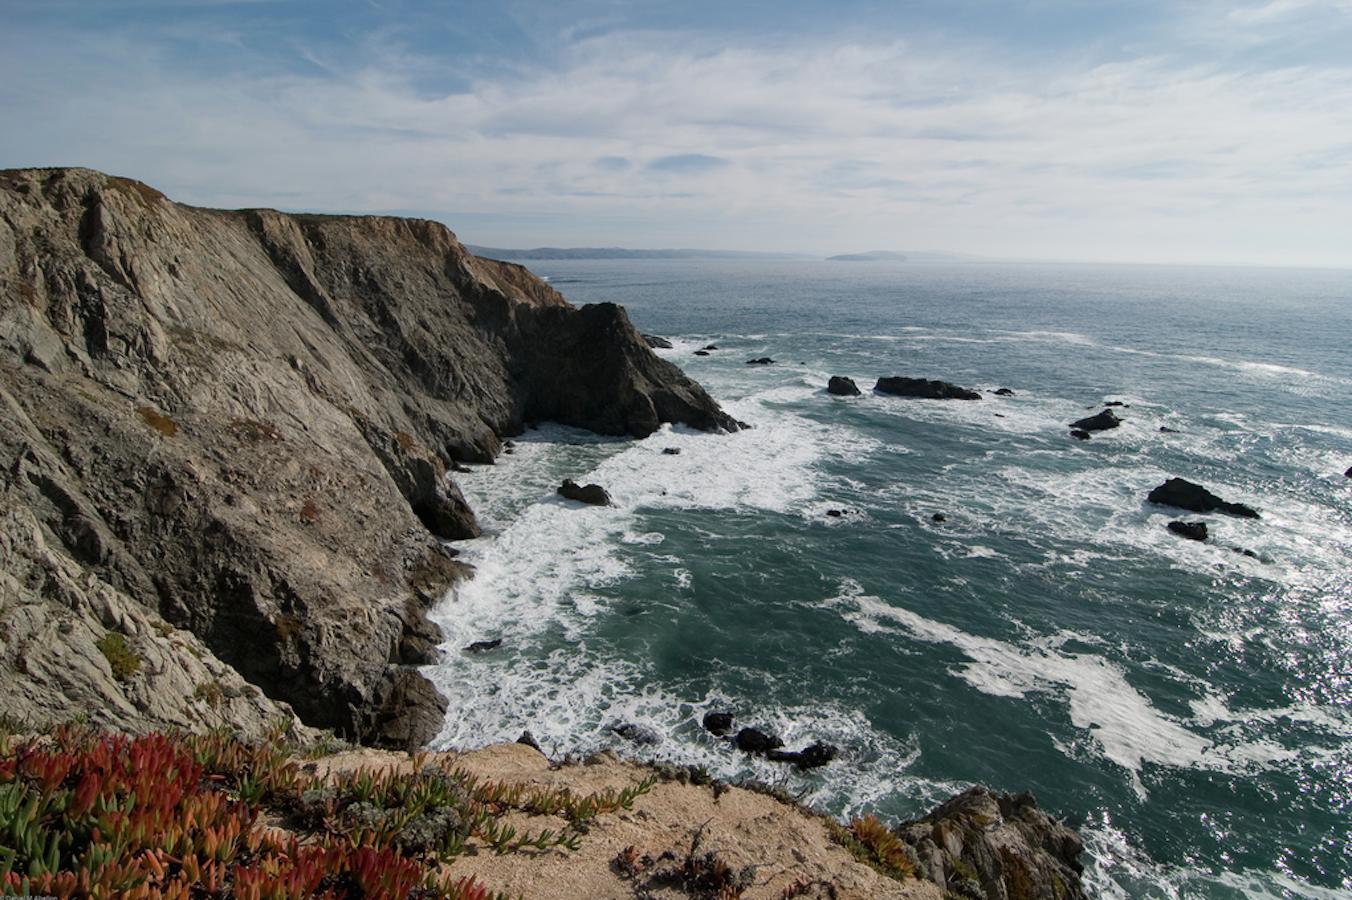 Oceans' Response to Change